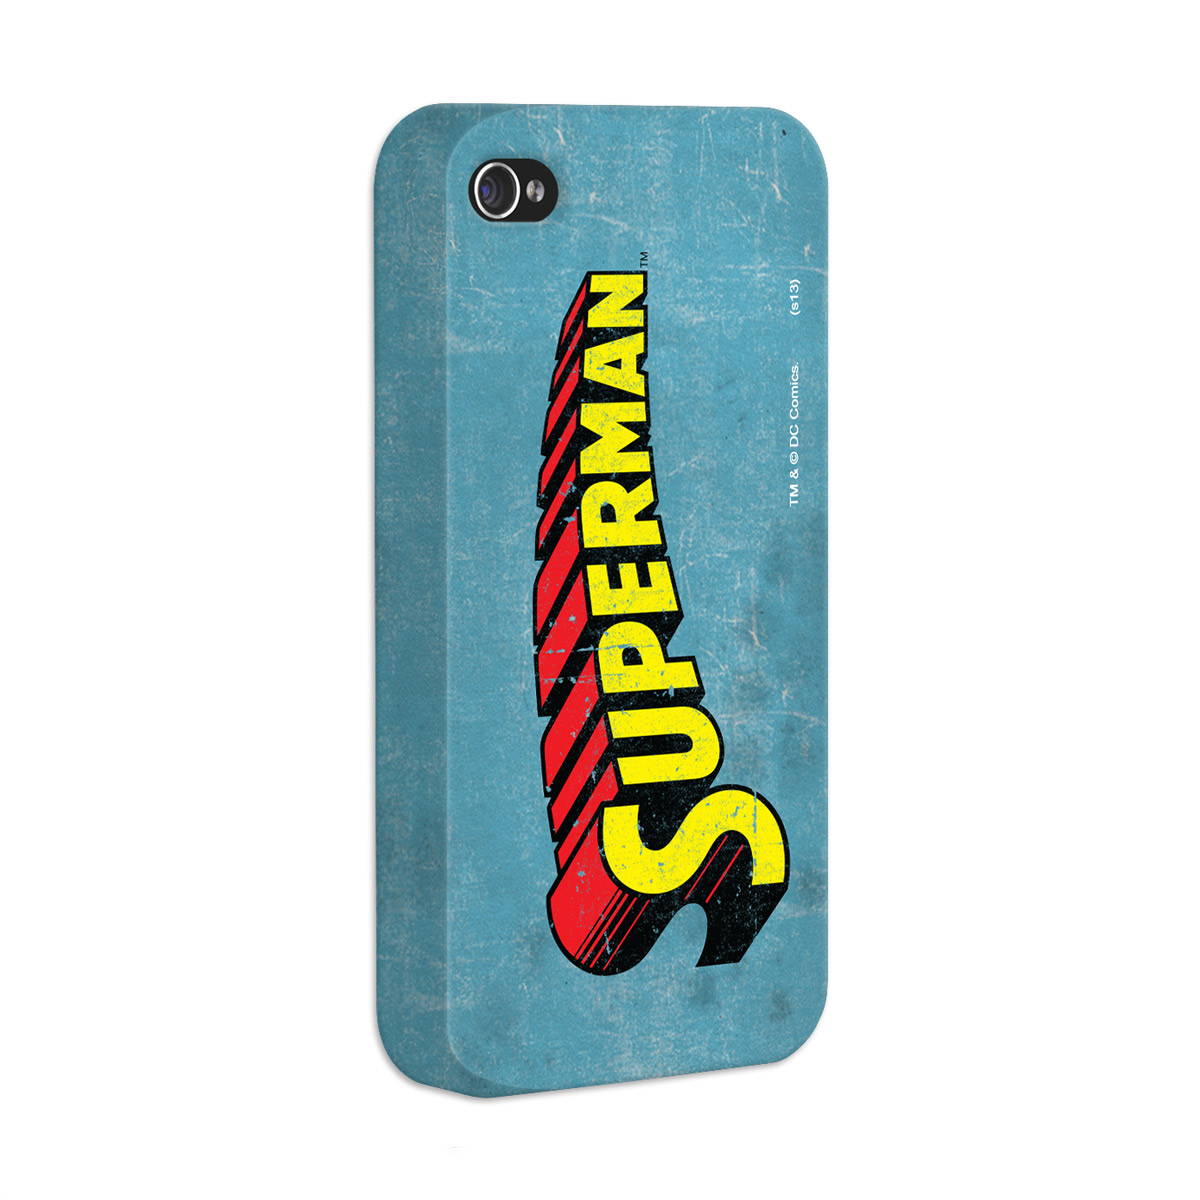 Capa de iPhone 4/4S Superman - Logo Classico